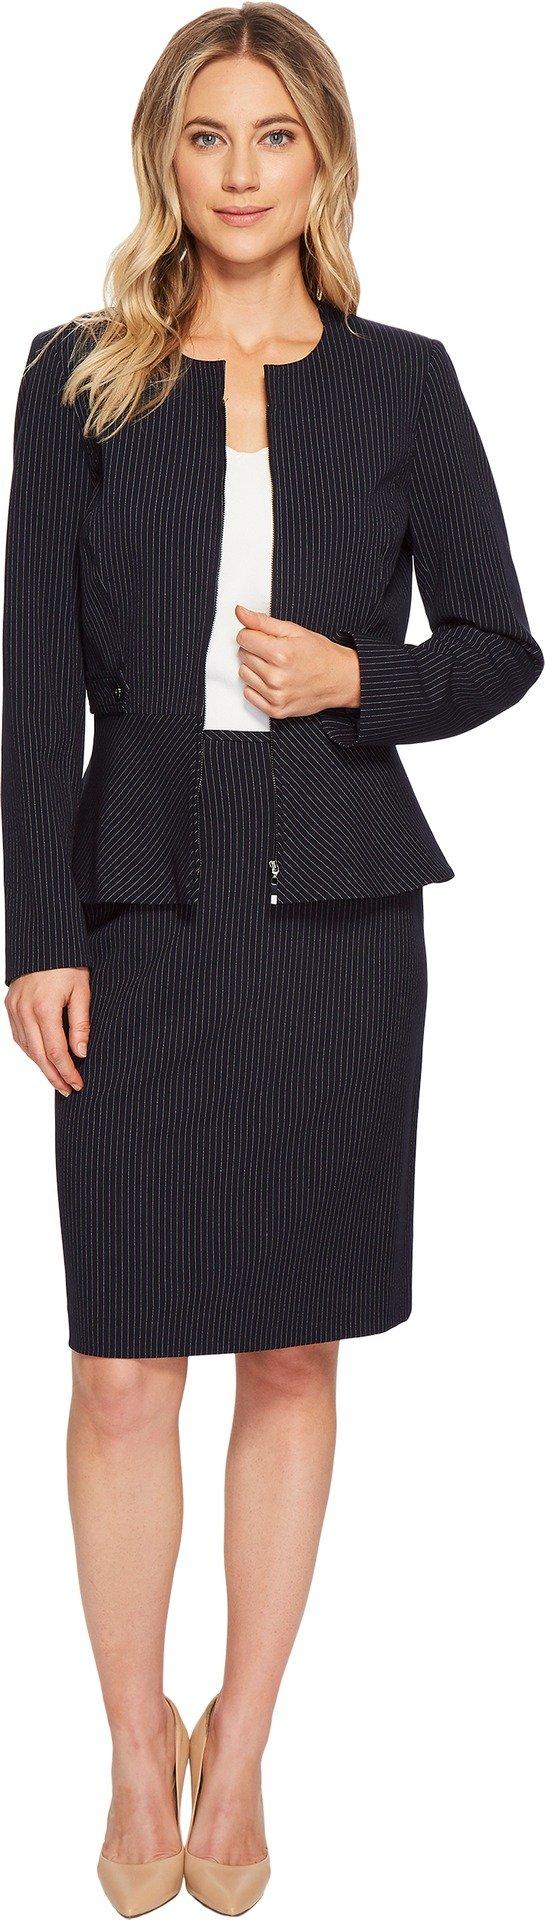 Tahari by ASL Women's Pinstripe Skirt Suit w/Waistband Tabs Navy/White 10 by Tahari ASL